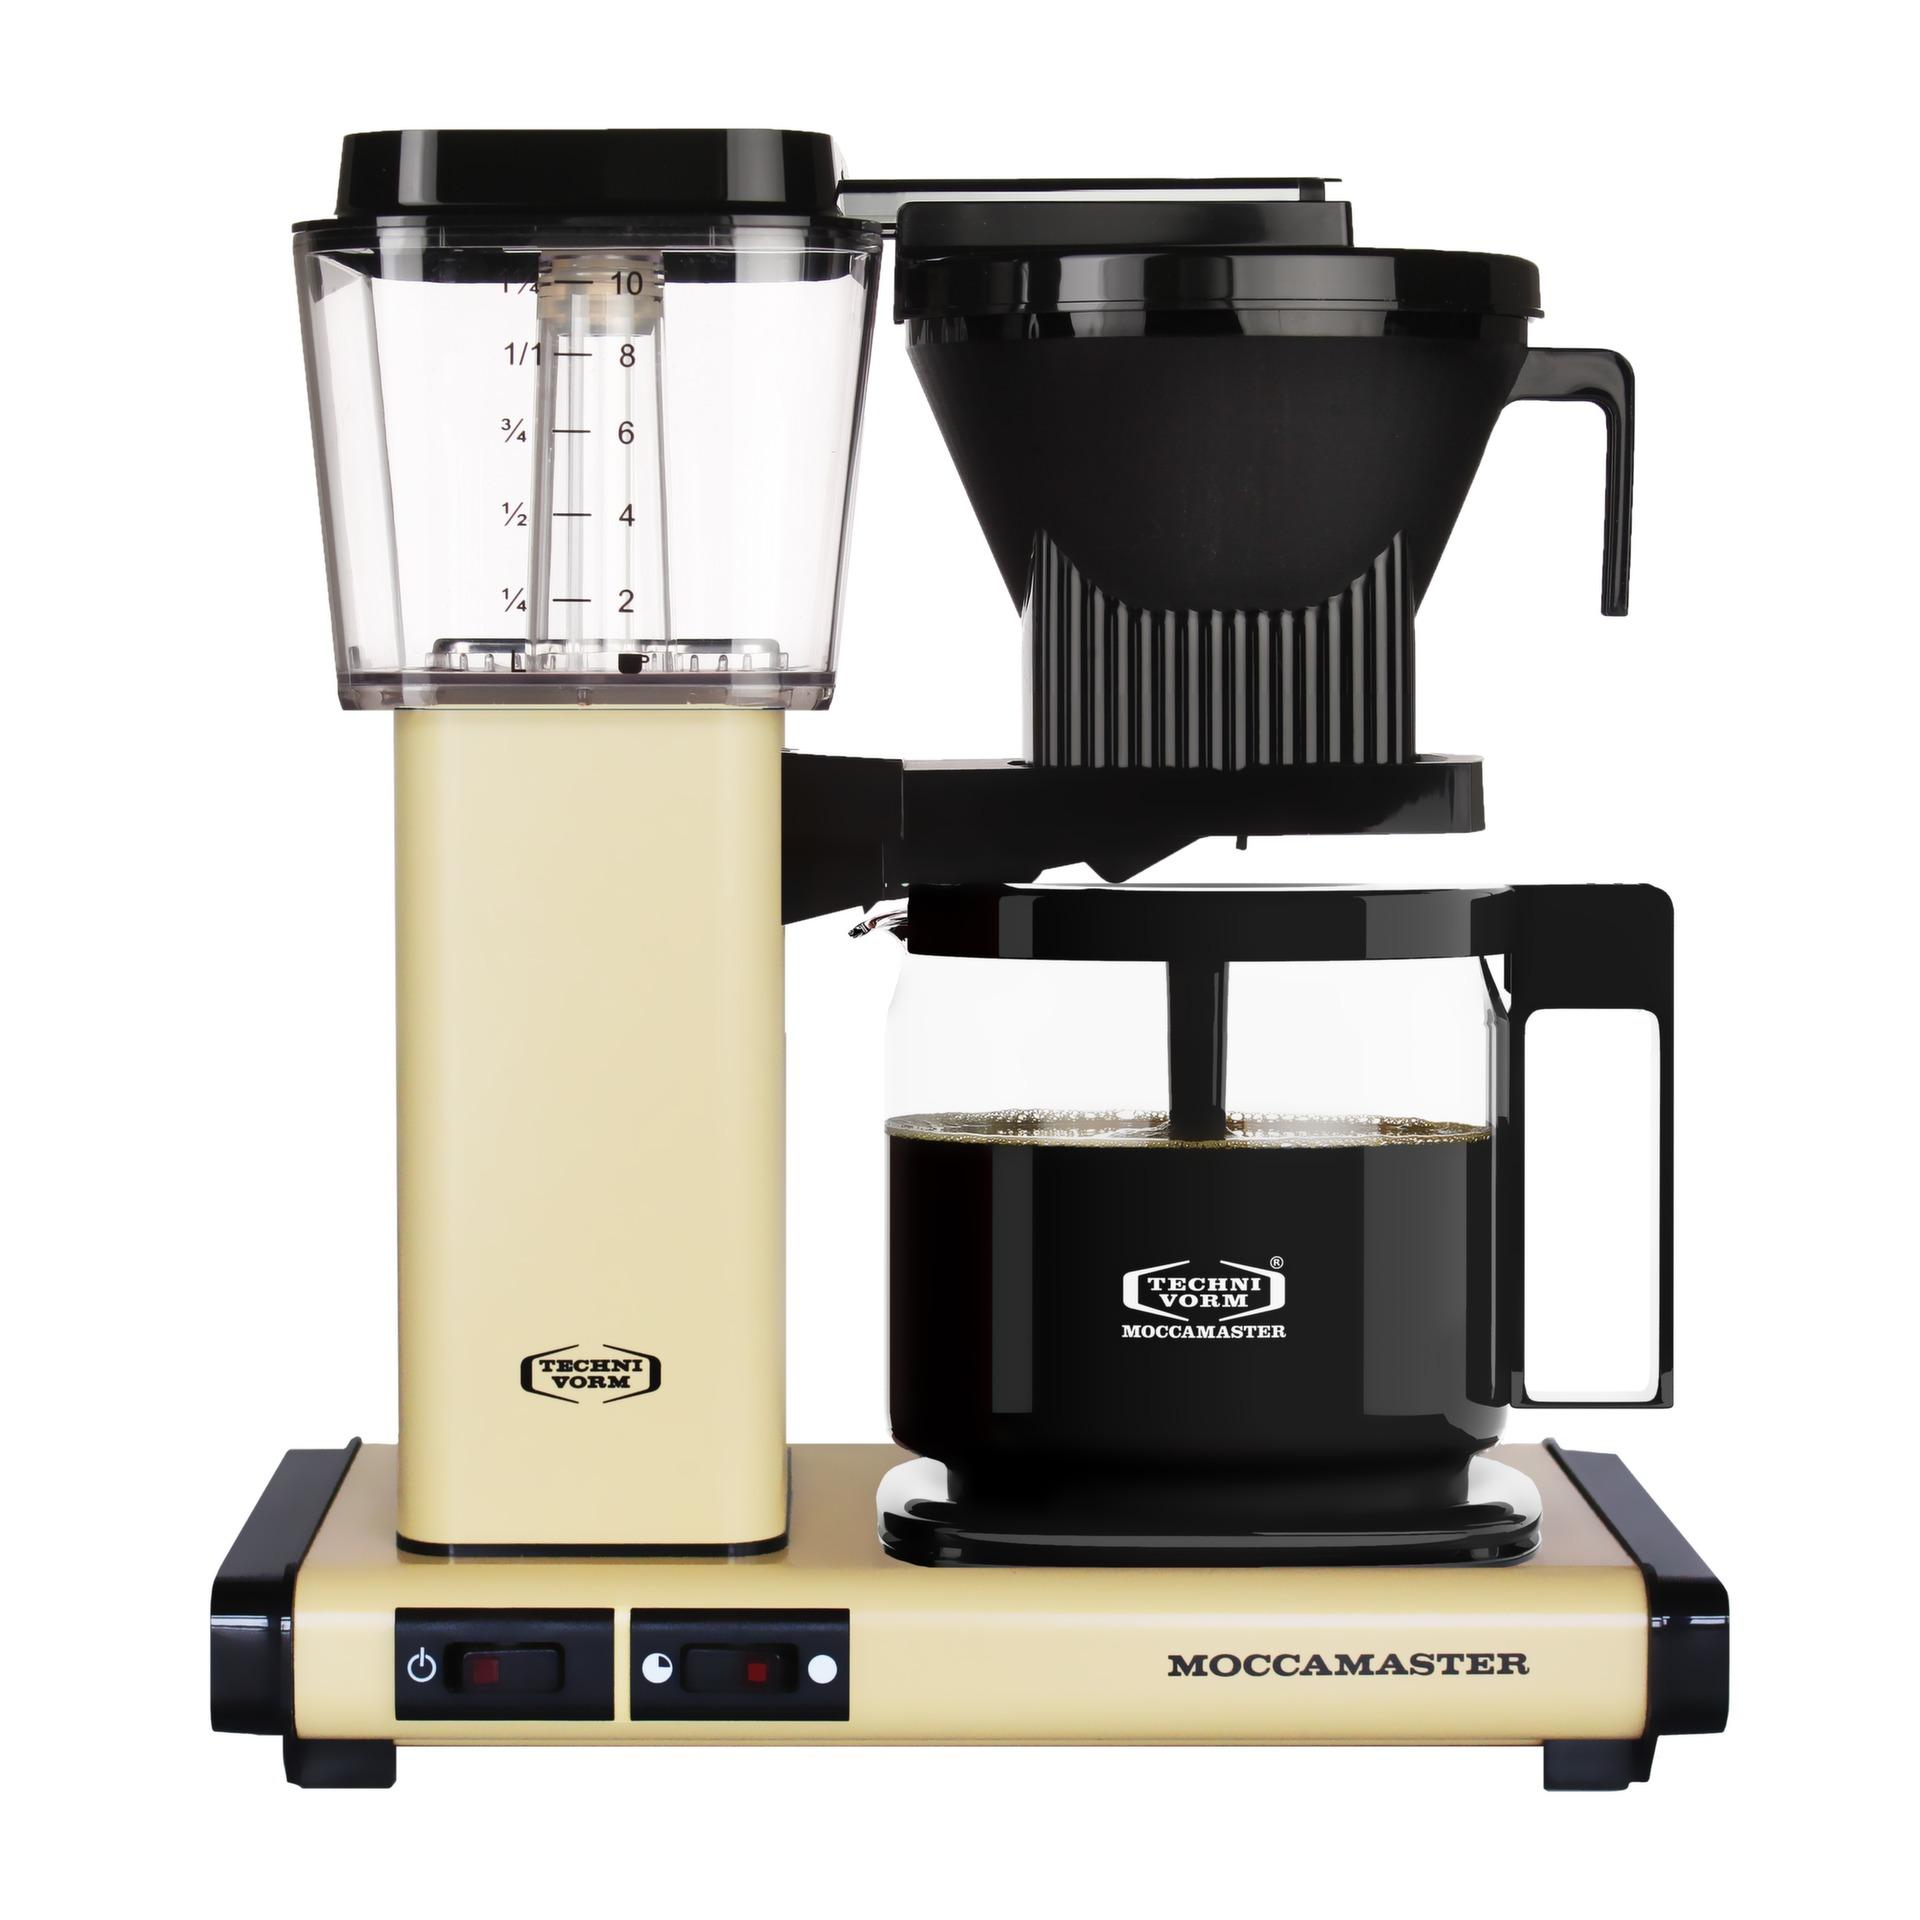 Moccamaster koffiefilter apparaat KBG741 AO pastel geel